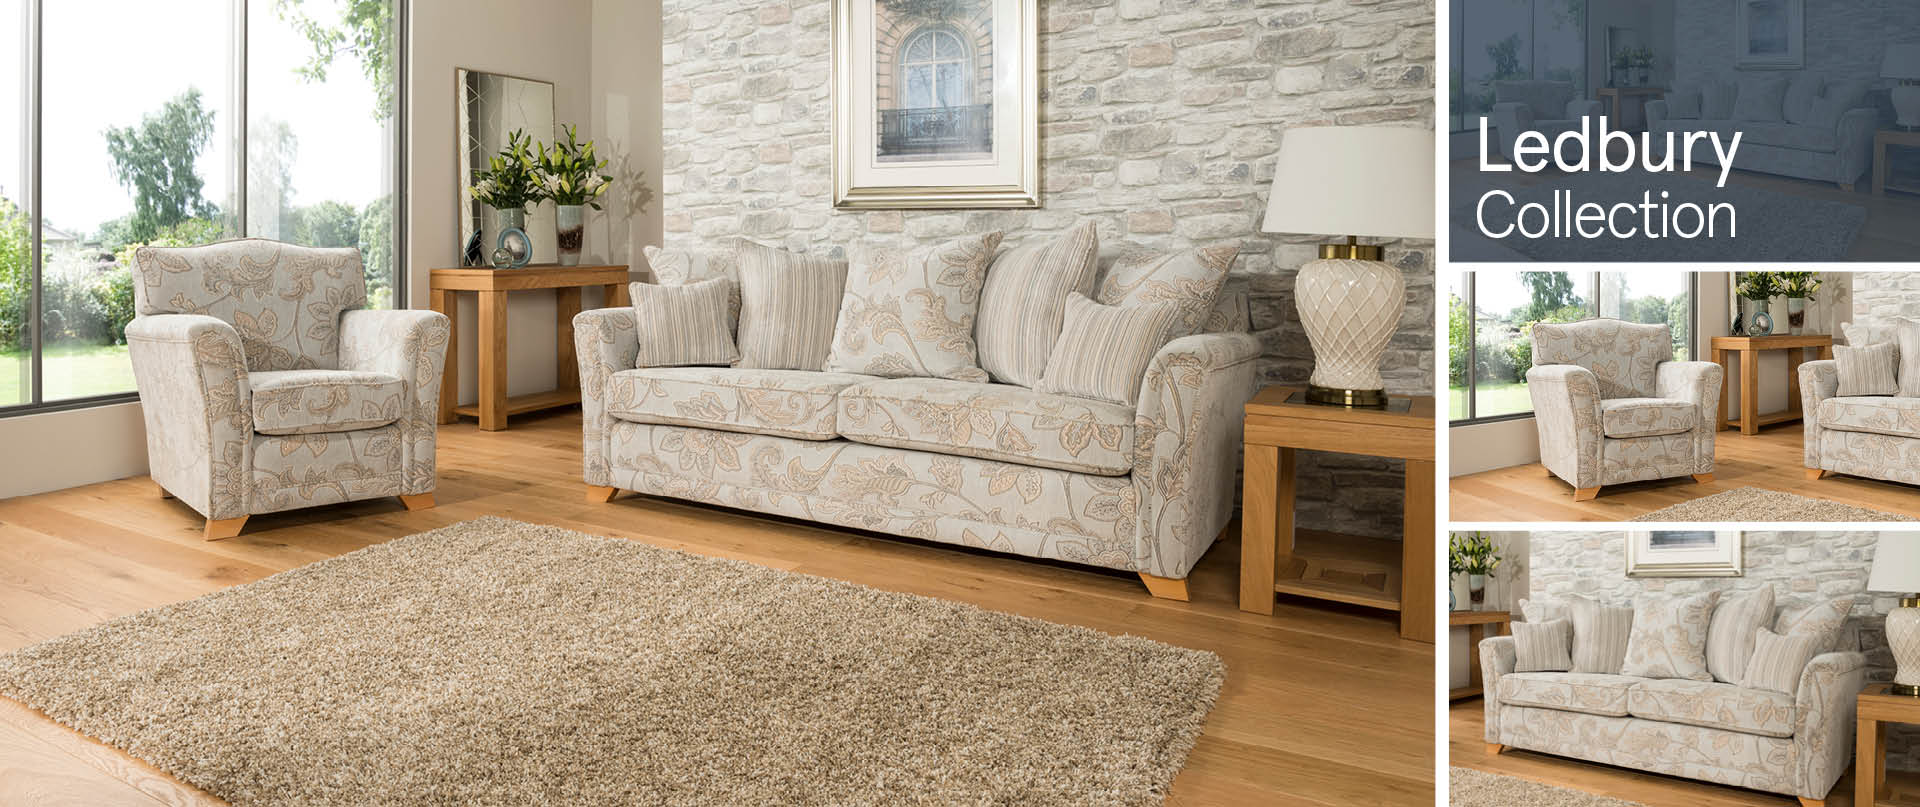 Ledbury Fabric Sofa Ranges